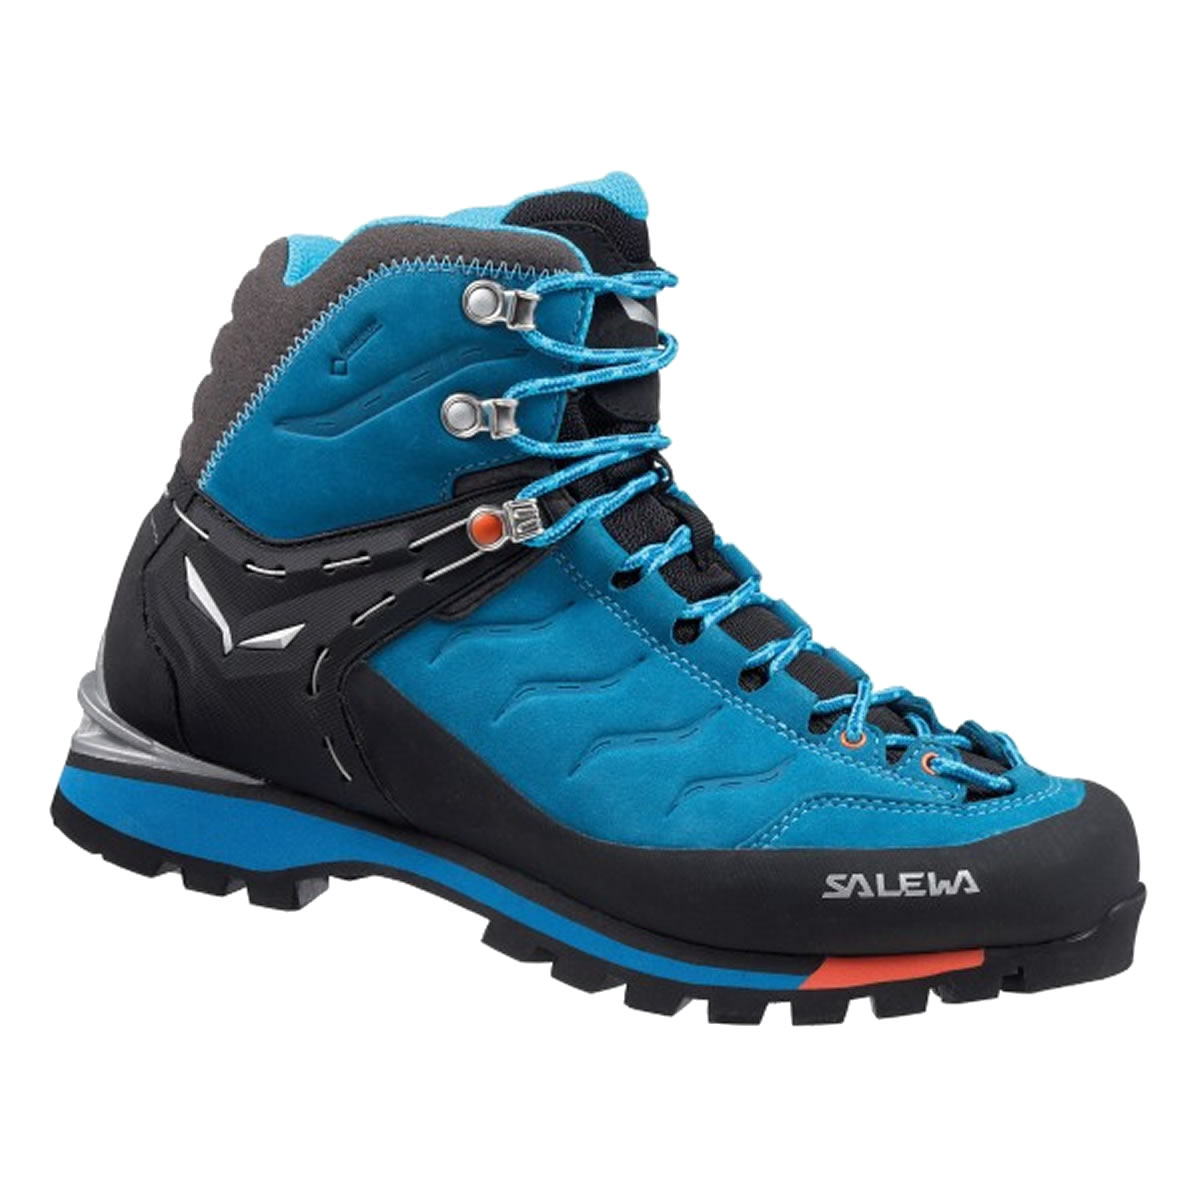 Salewa Rapace Womens Gtx Mountaineering Boots Epictv Shop